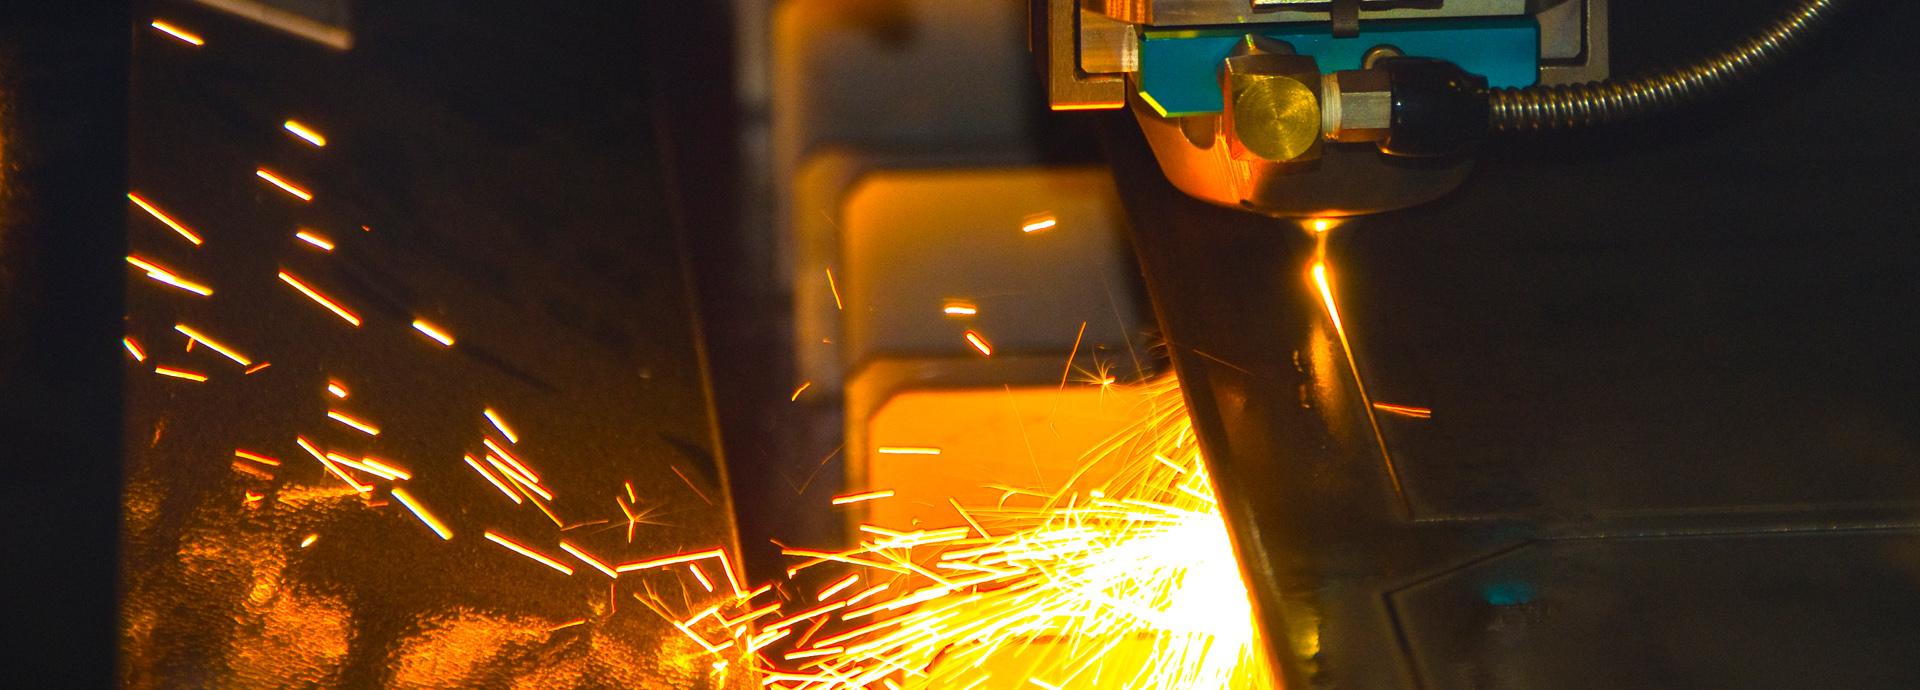 Laser Cutting   Horschel Brothers Precision